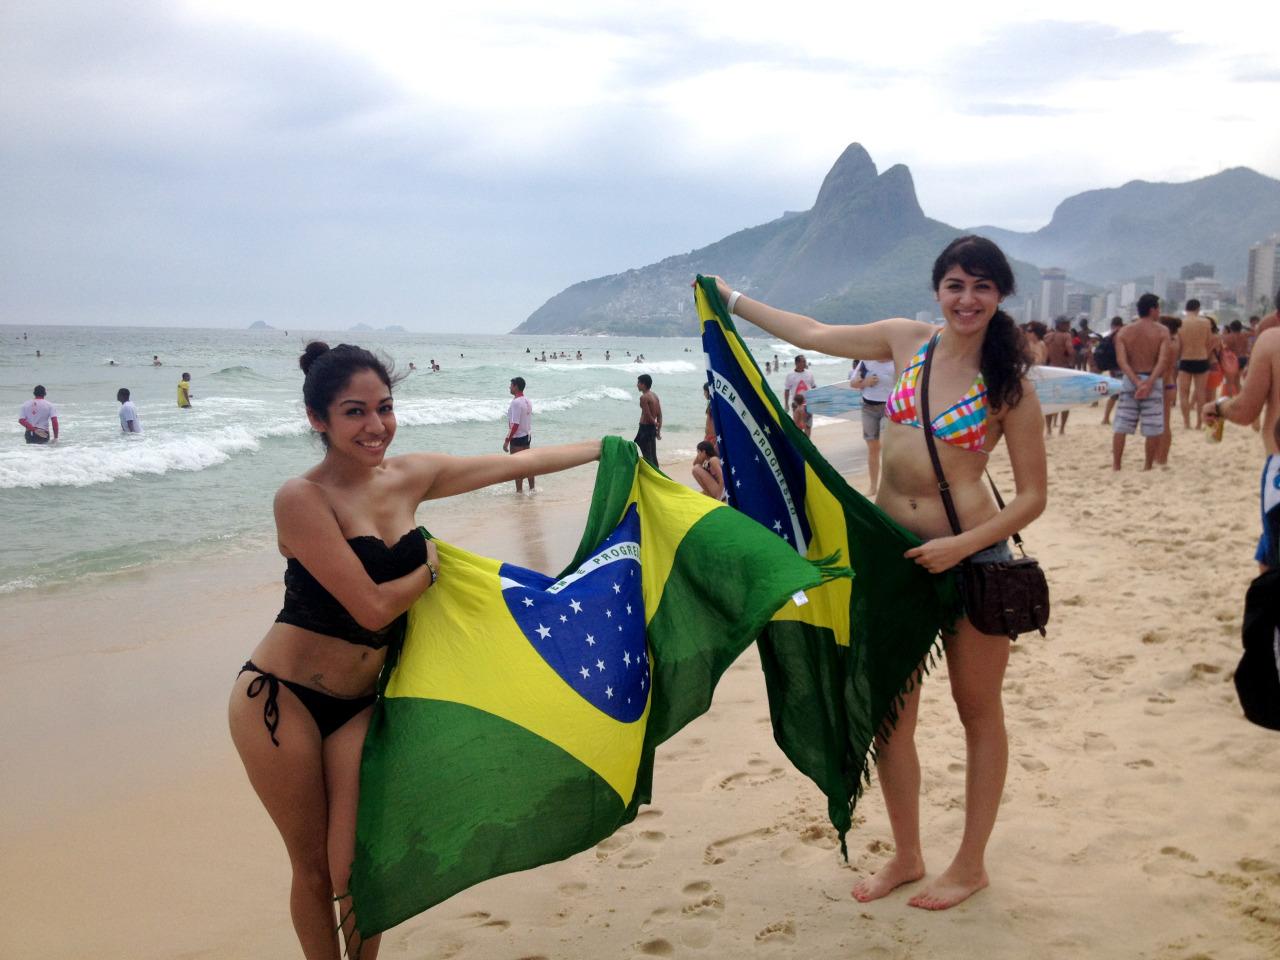 Gauchos in Brasil!